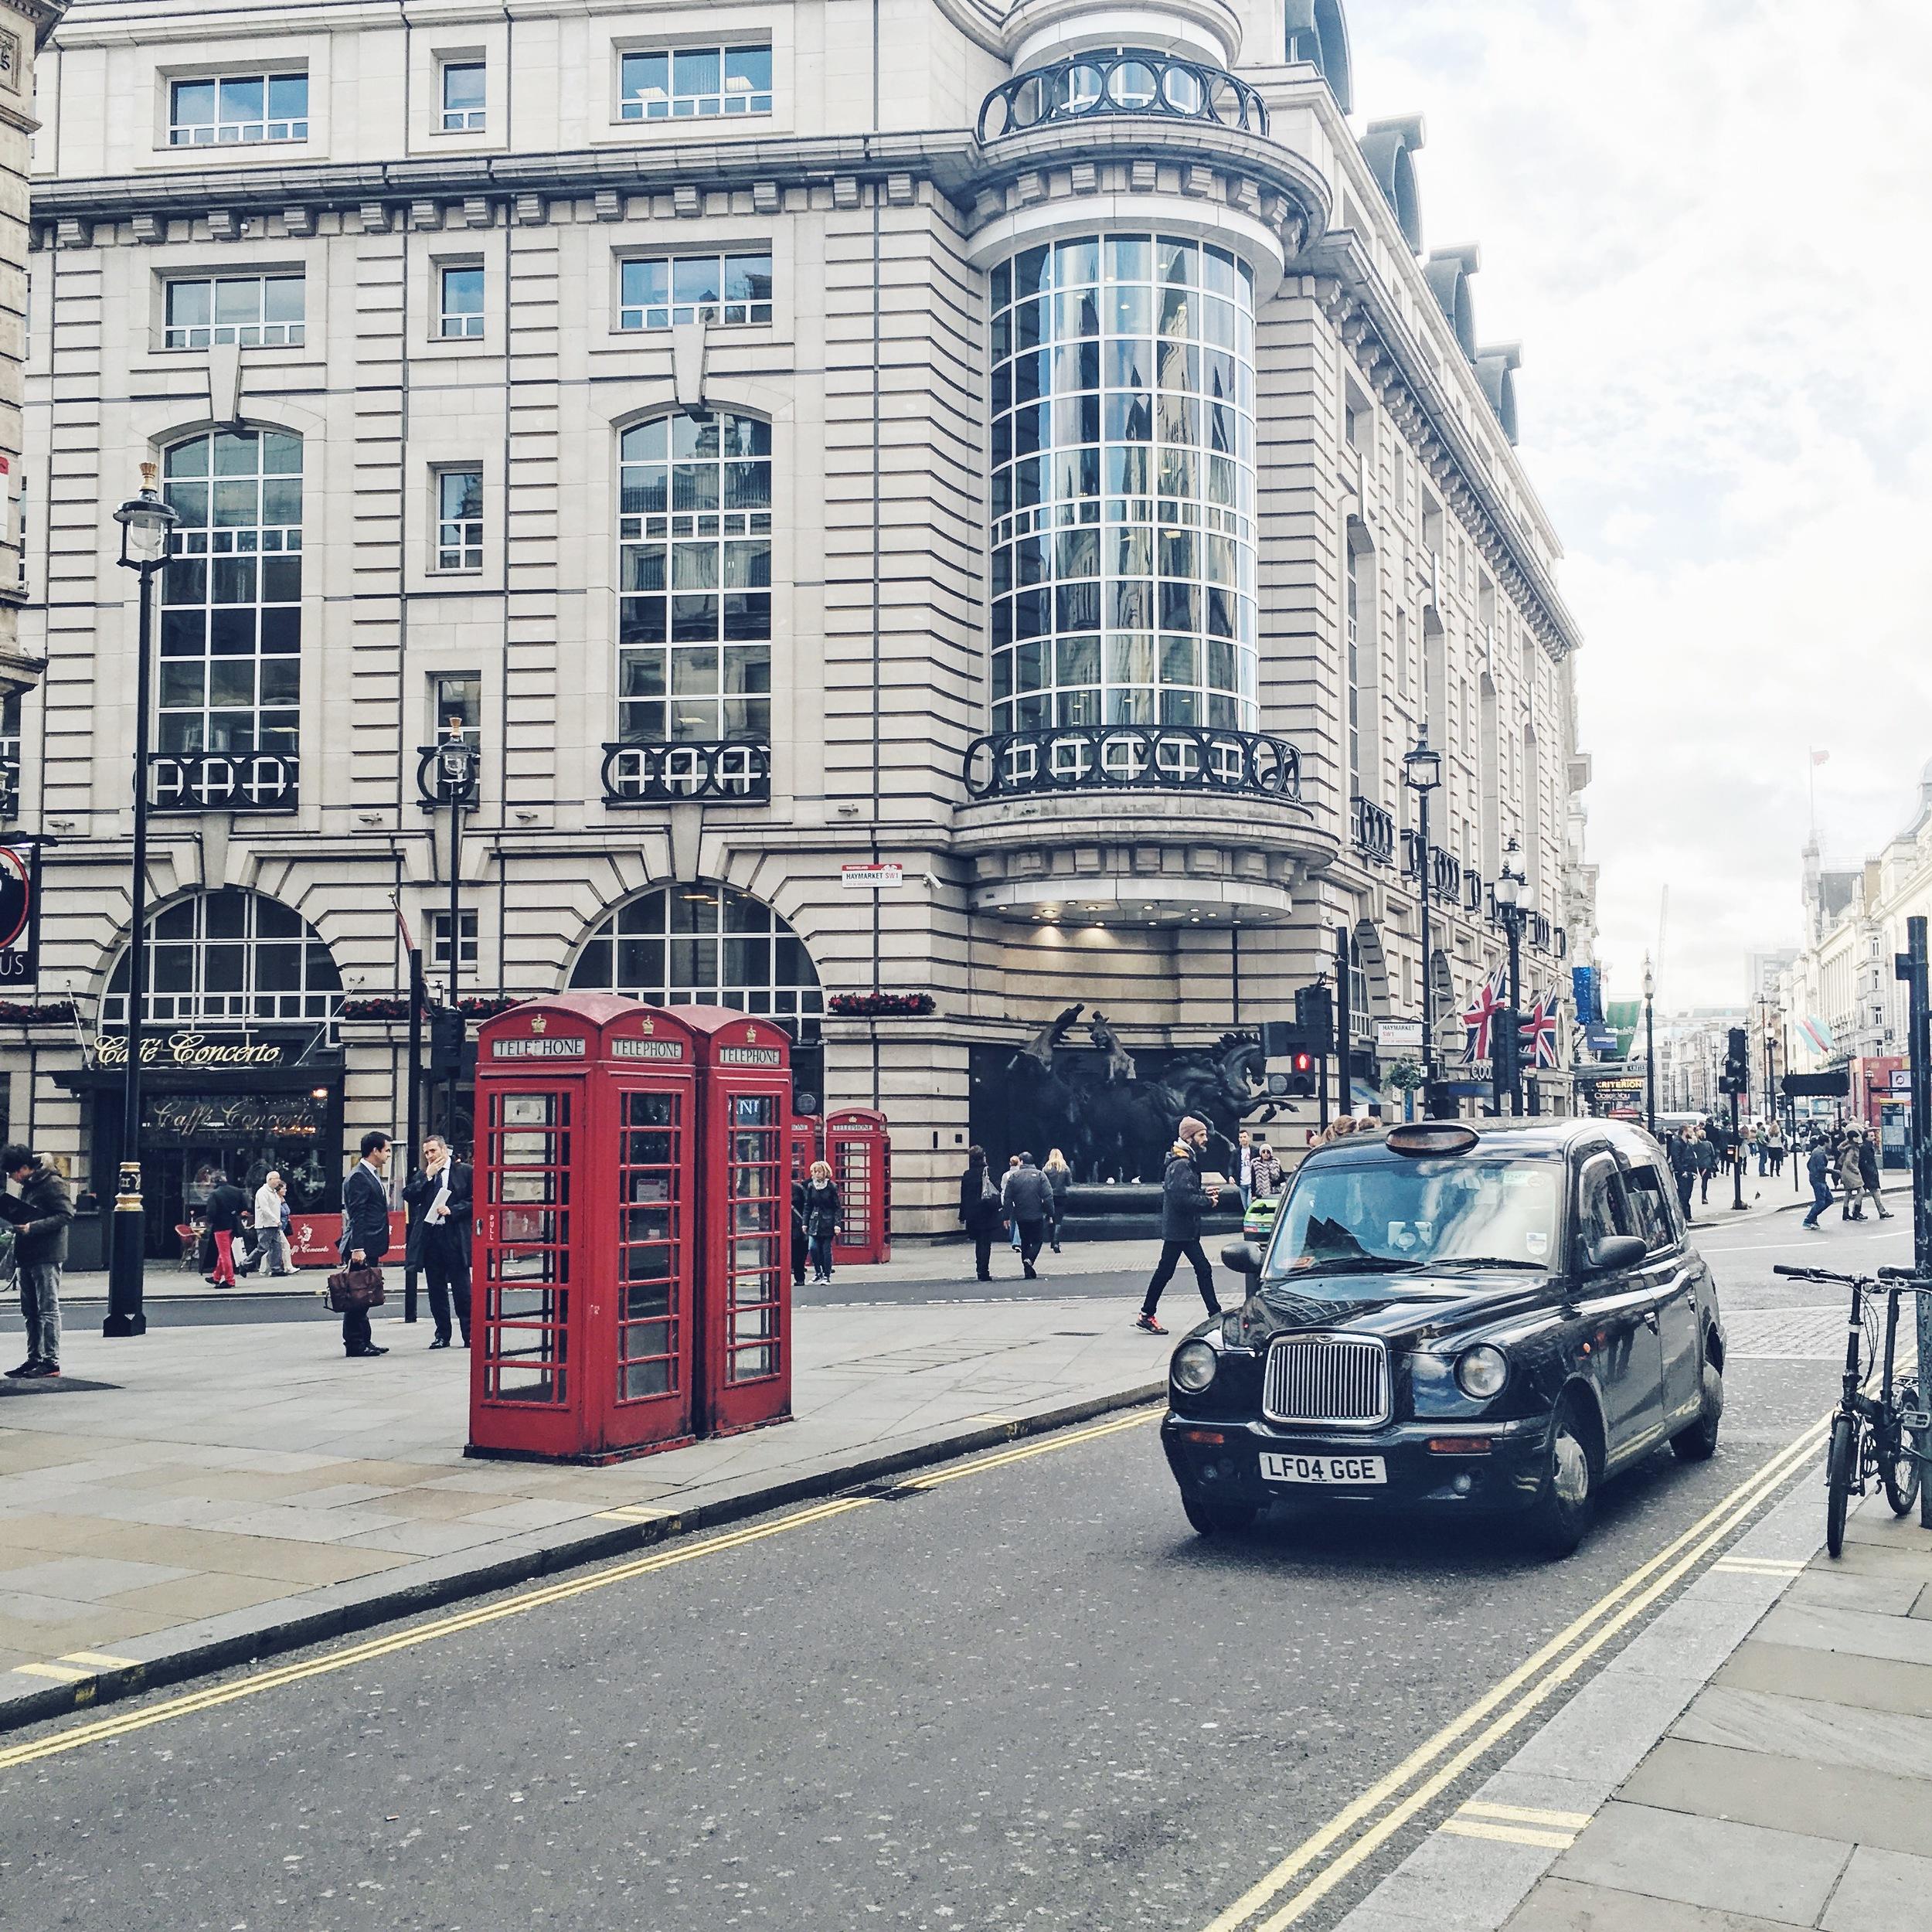 London Scene on Oxford Street